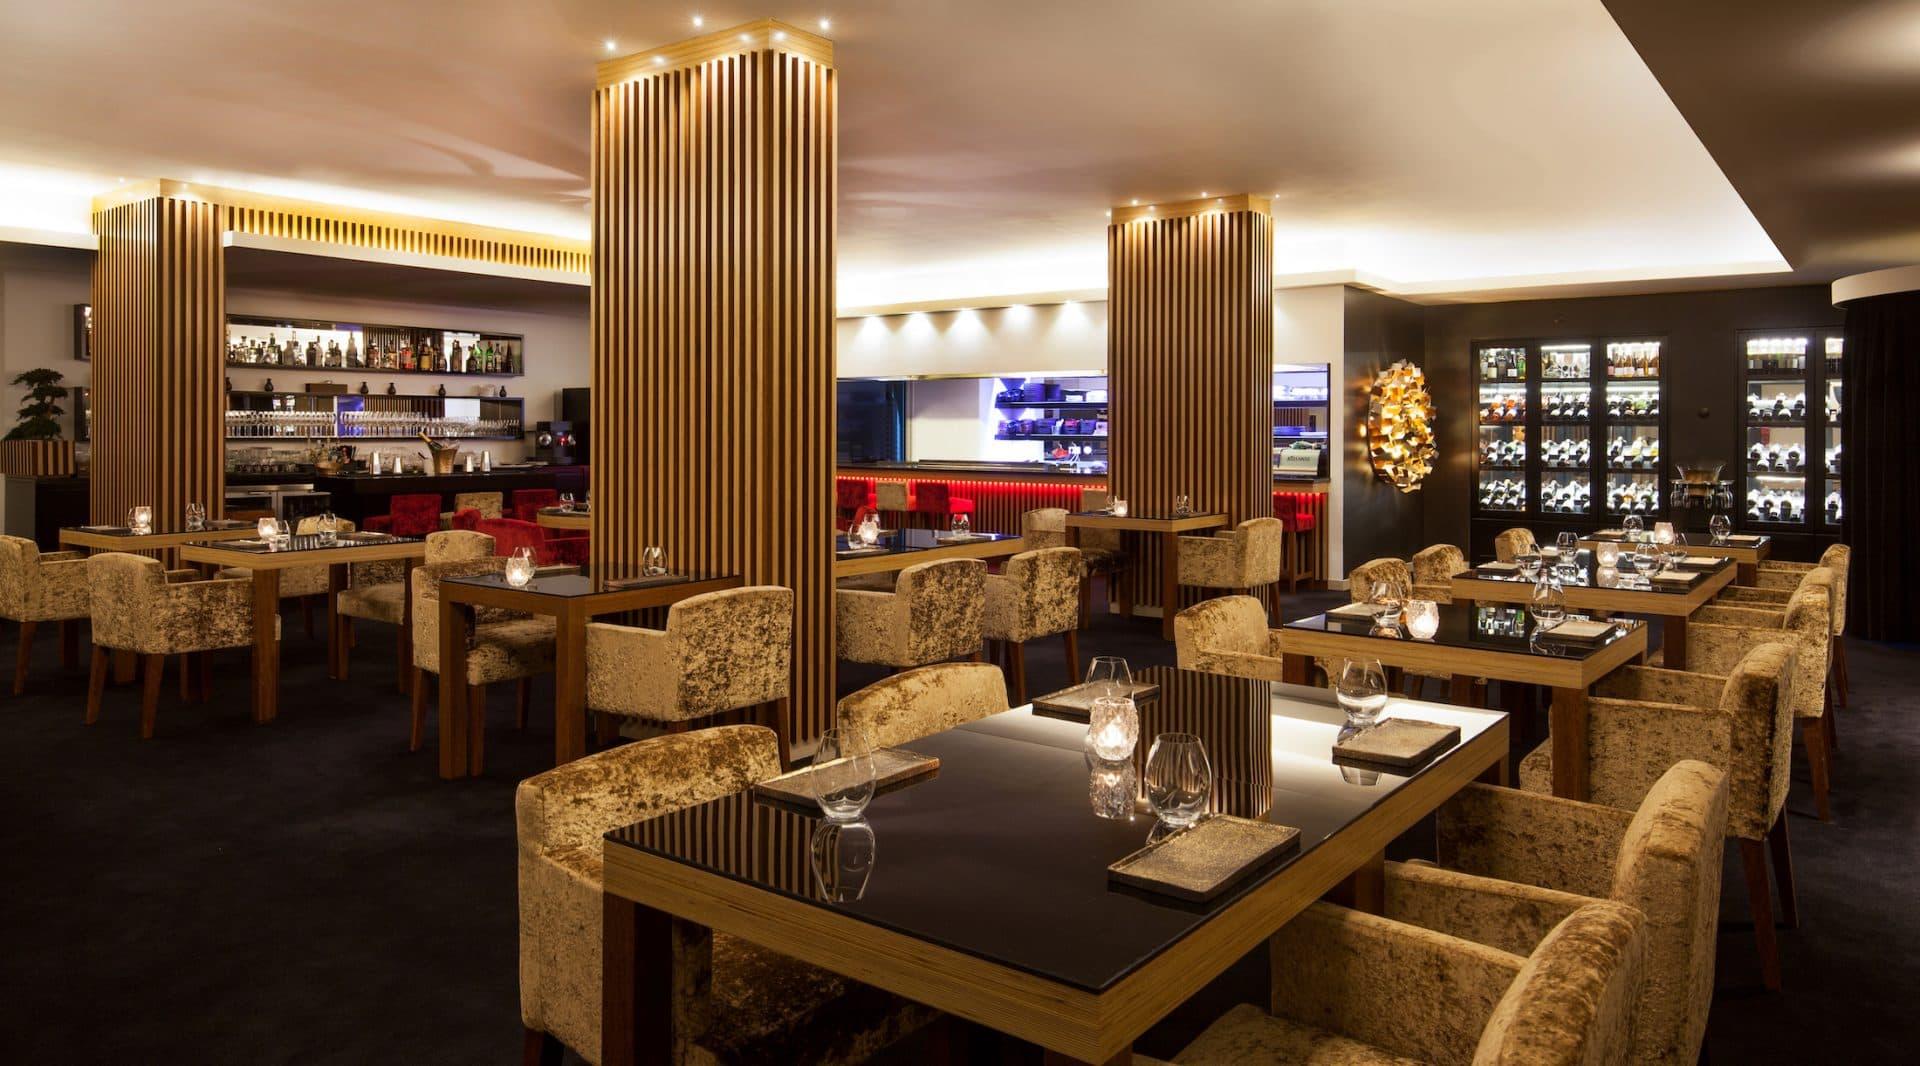 aji-oriental-flavors-vidamar-hotels-resorts-algarve-2